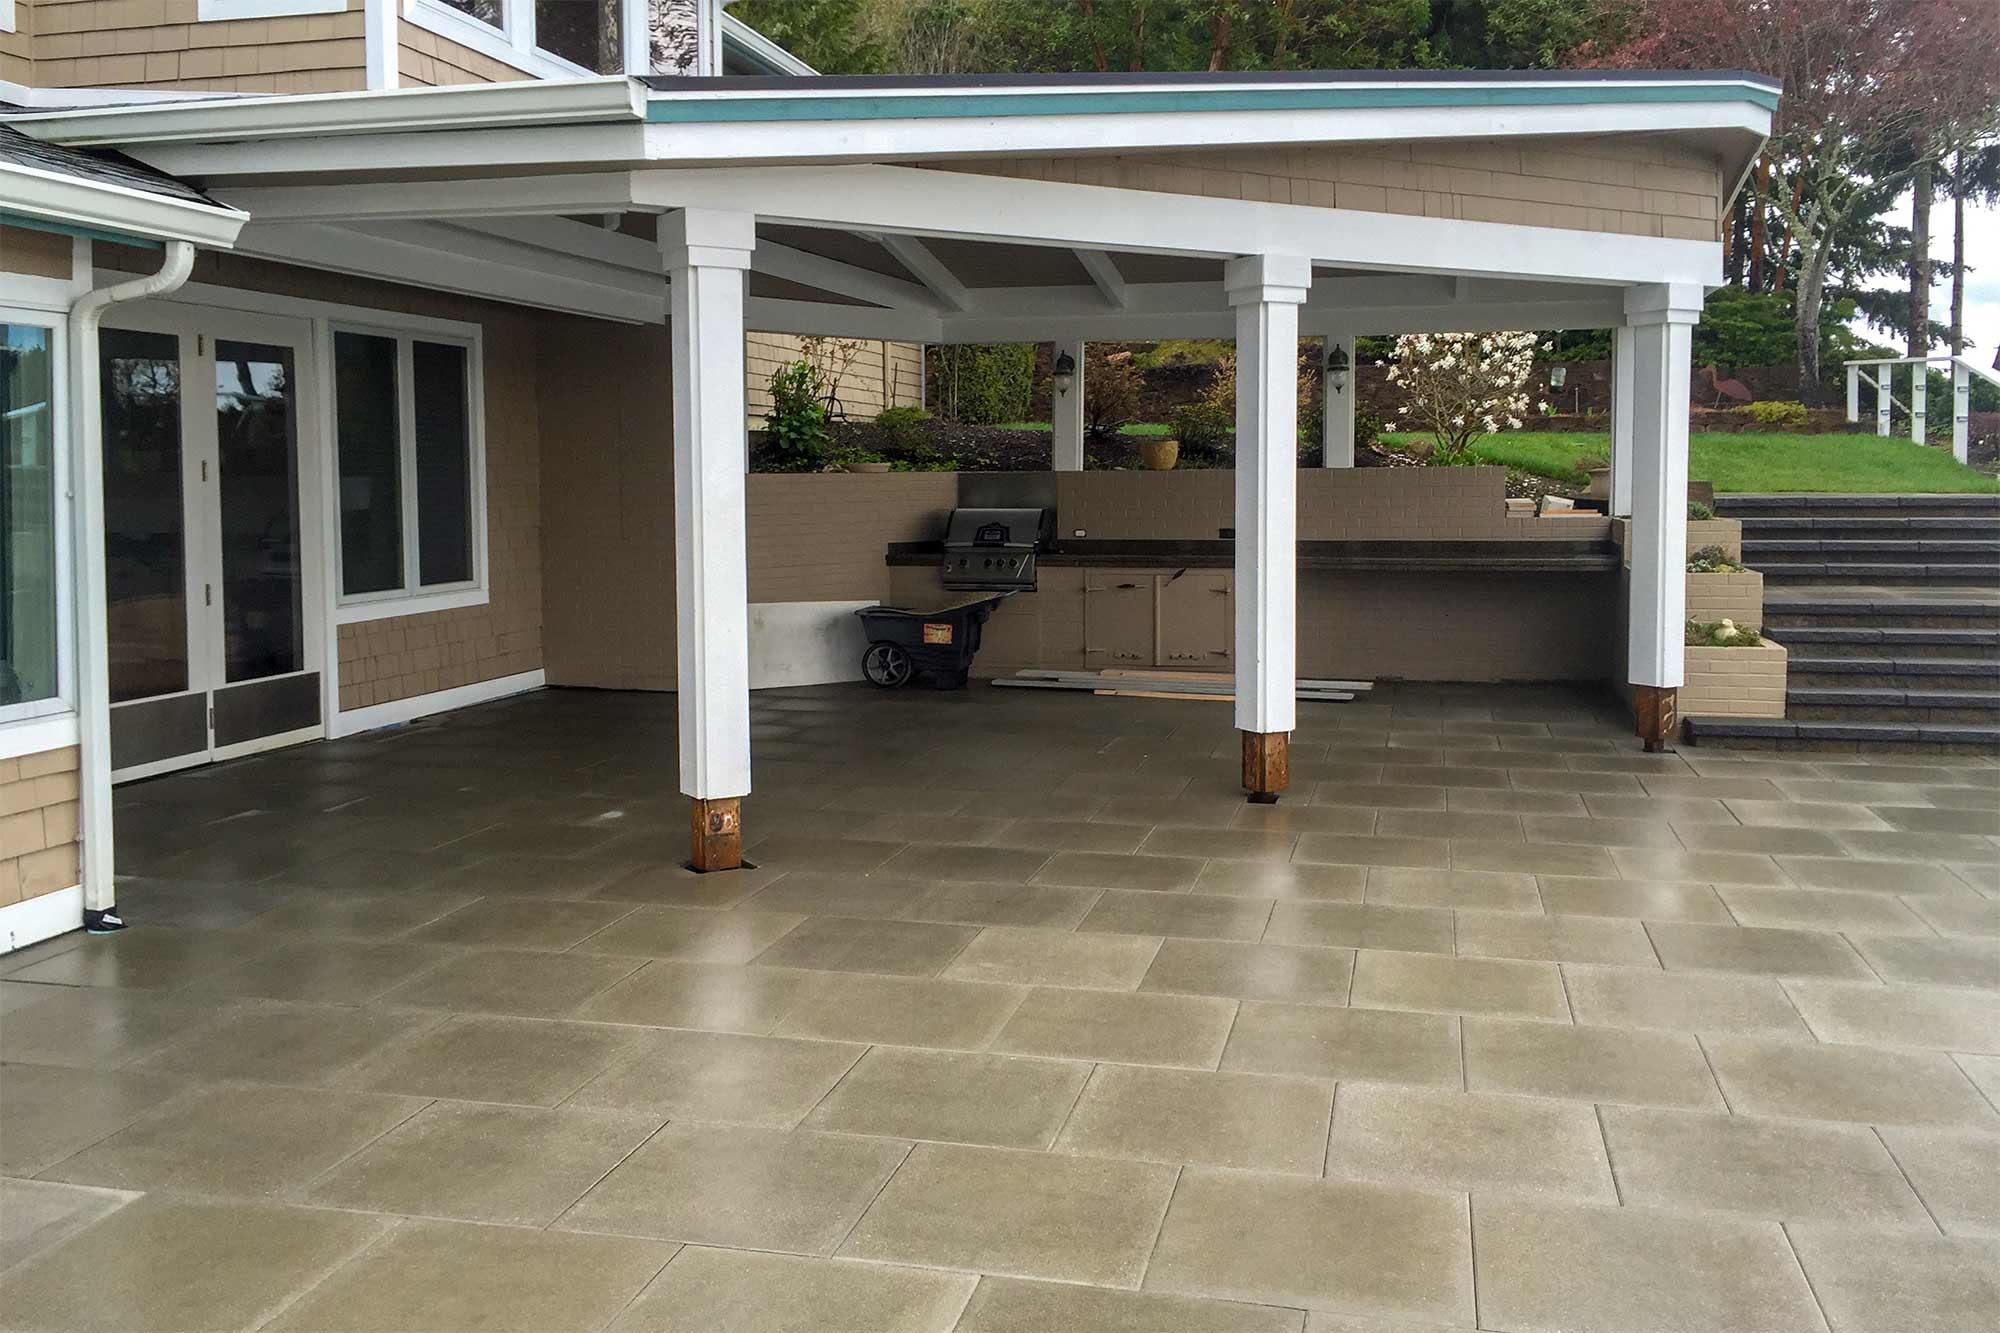 Vancouver Bay paver patio